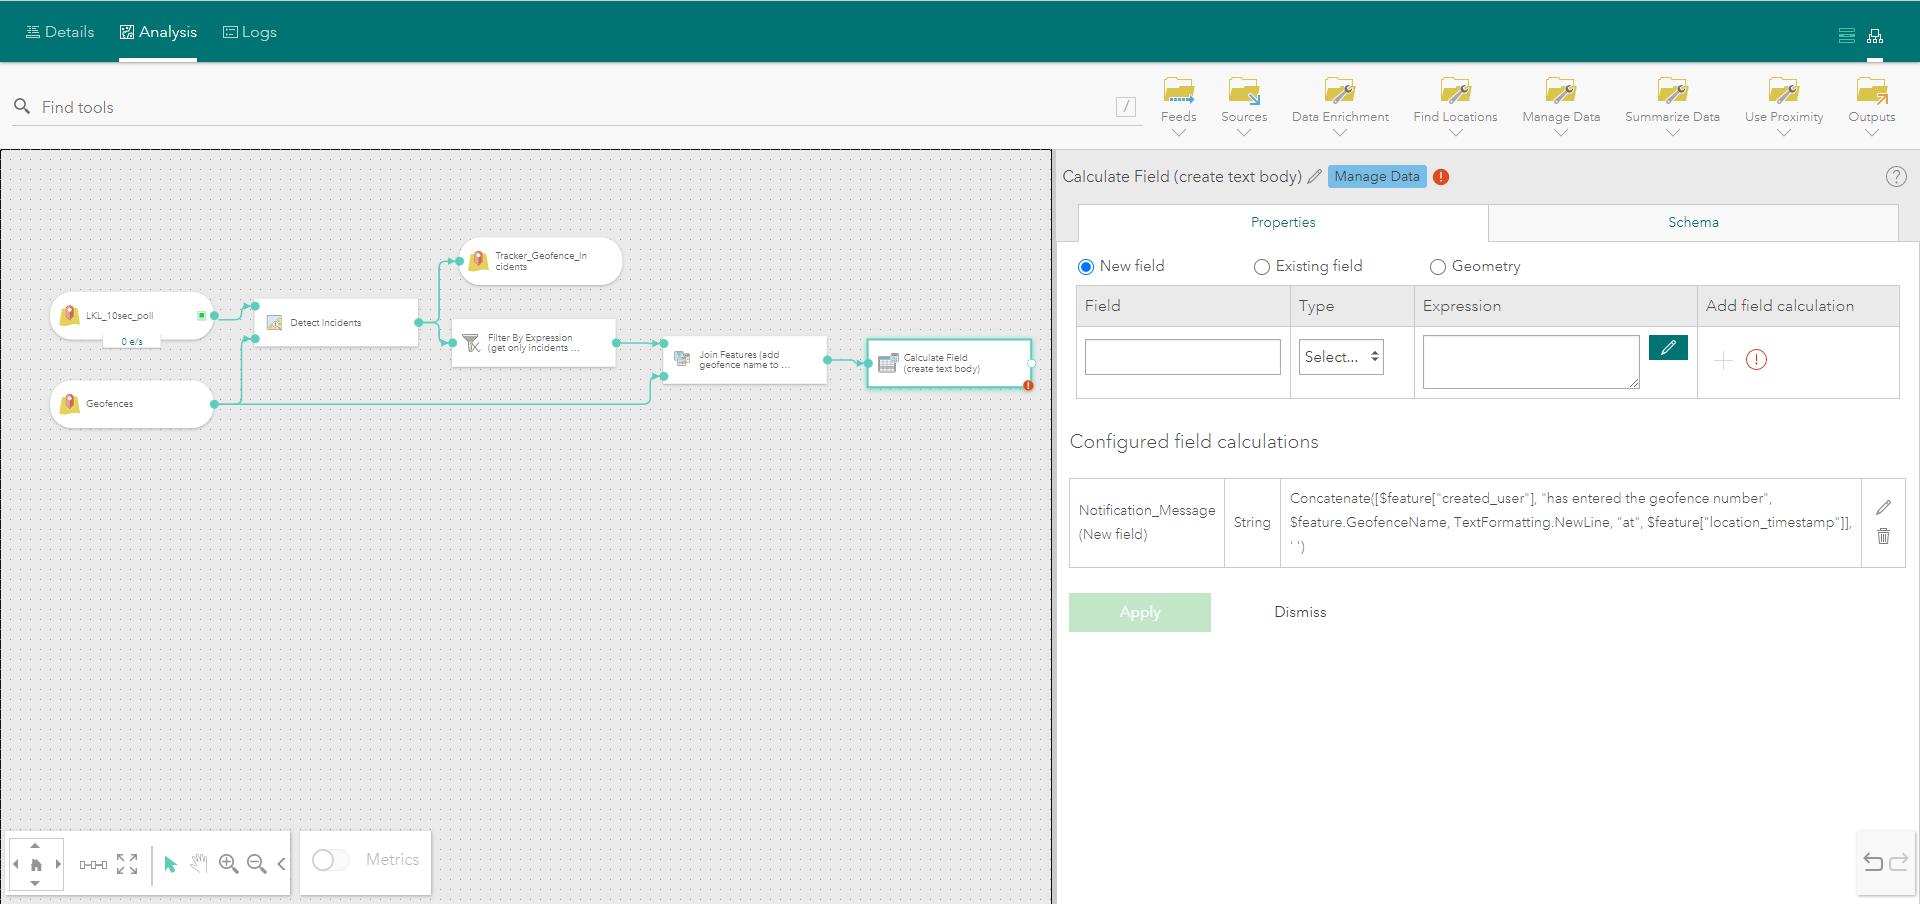 Calculate Field tool parameters